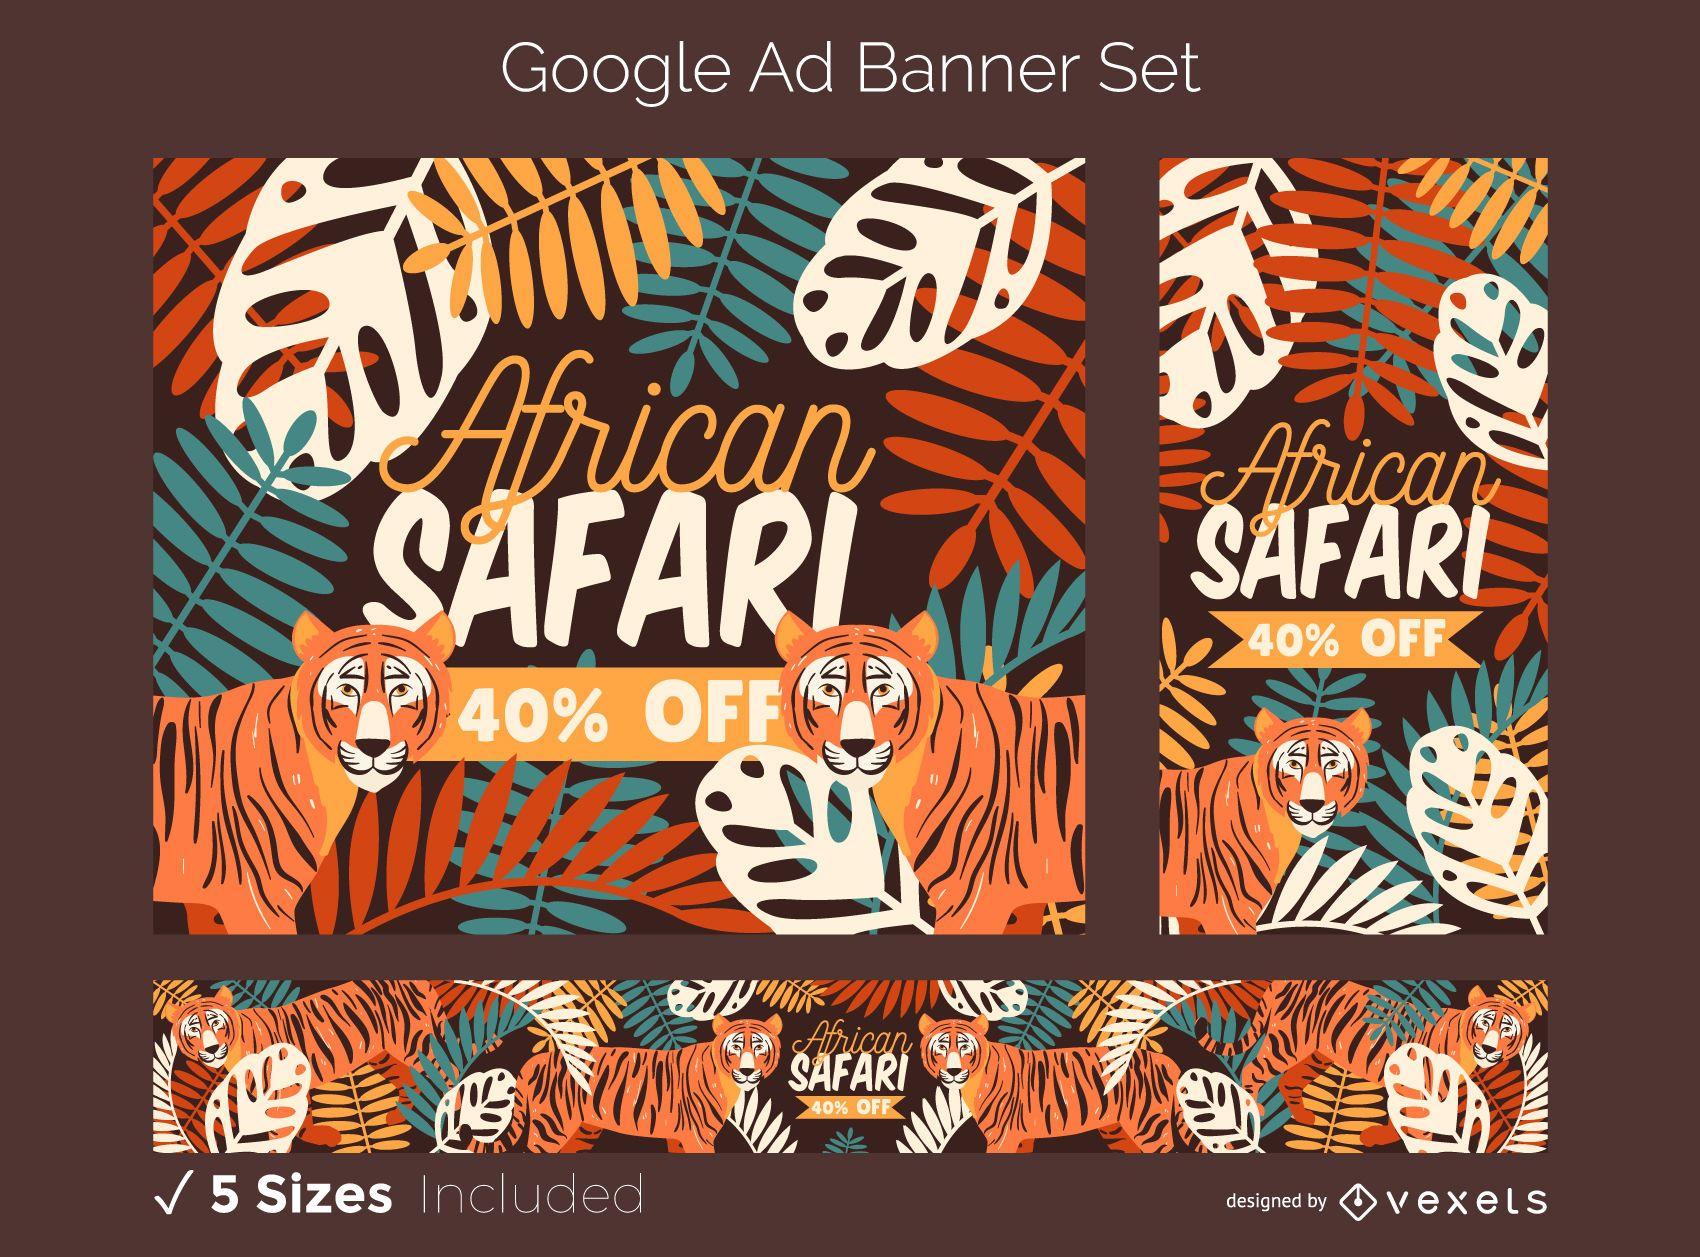 African Safari Google Ads Banner Set